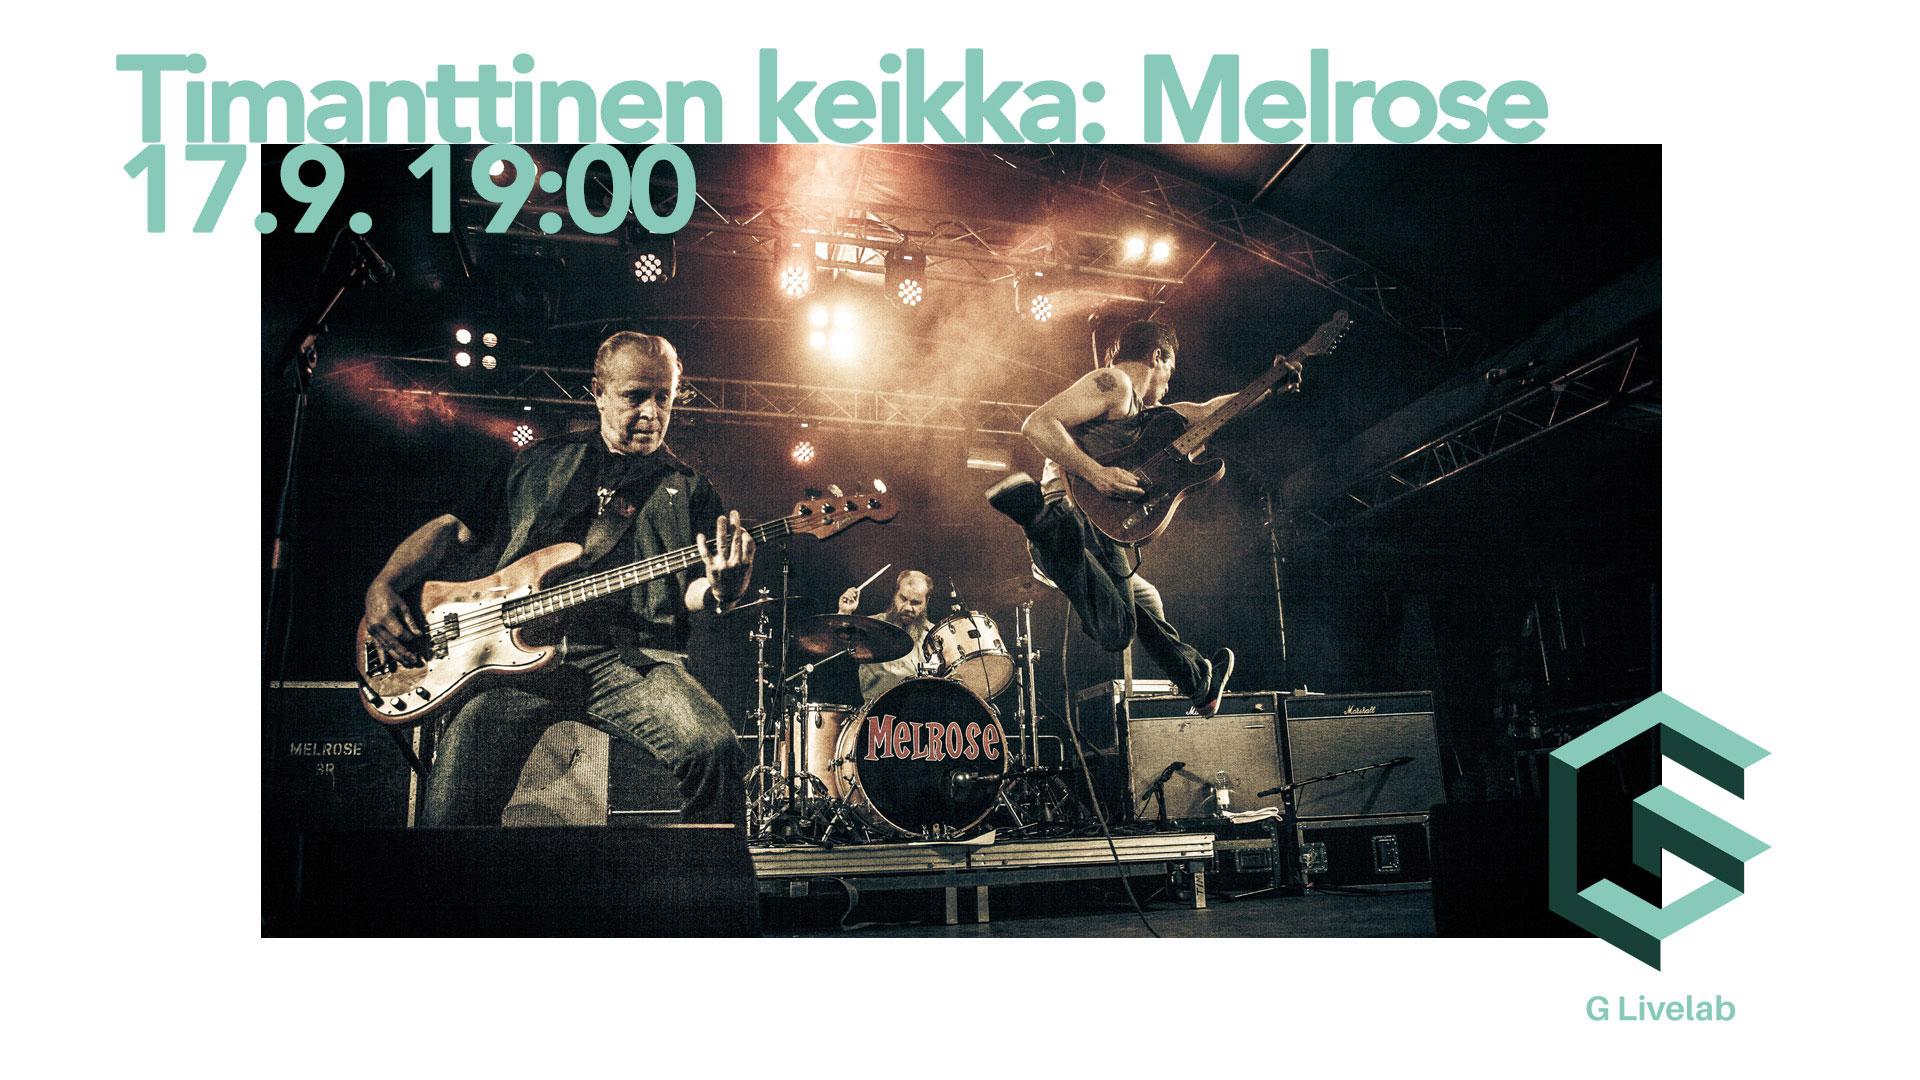 Link to event Timanttinen keikka: Melrose